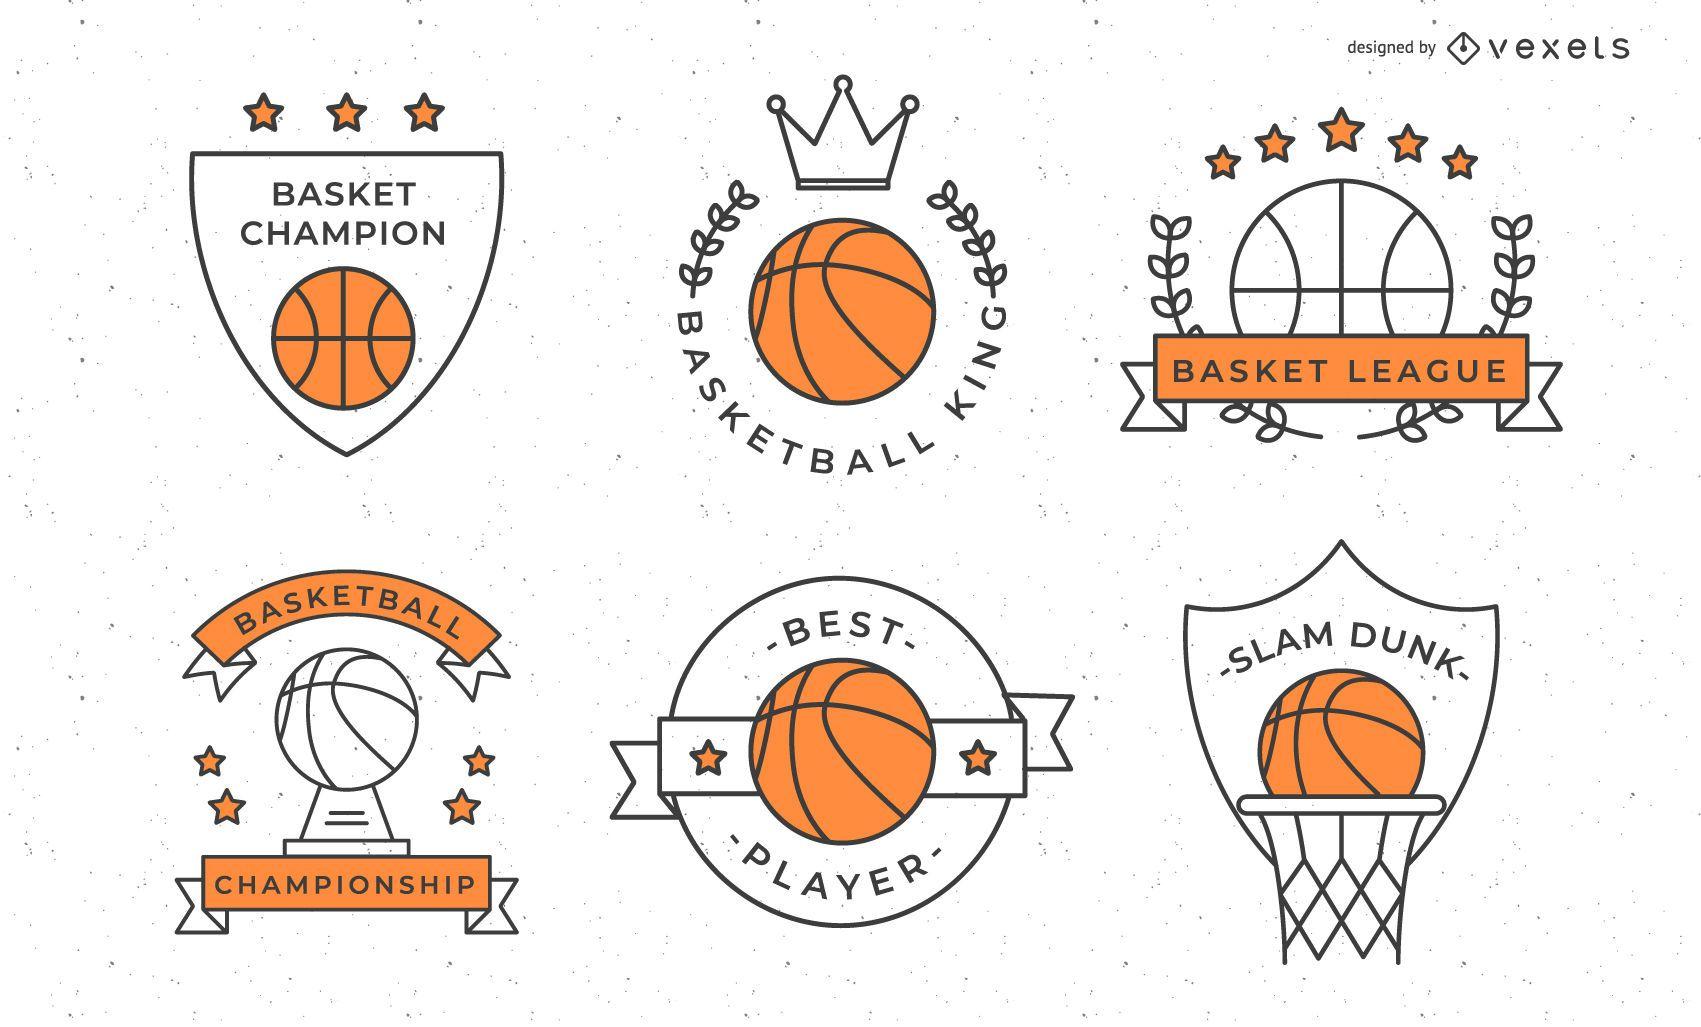 Colecci?n de insignias de baloncesto